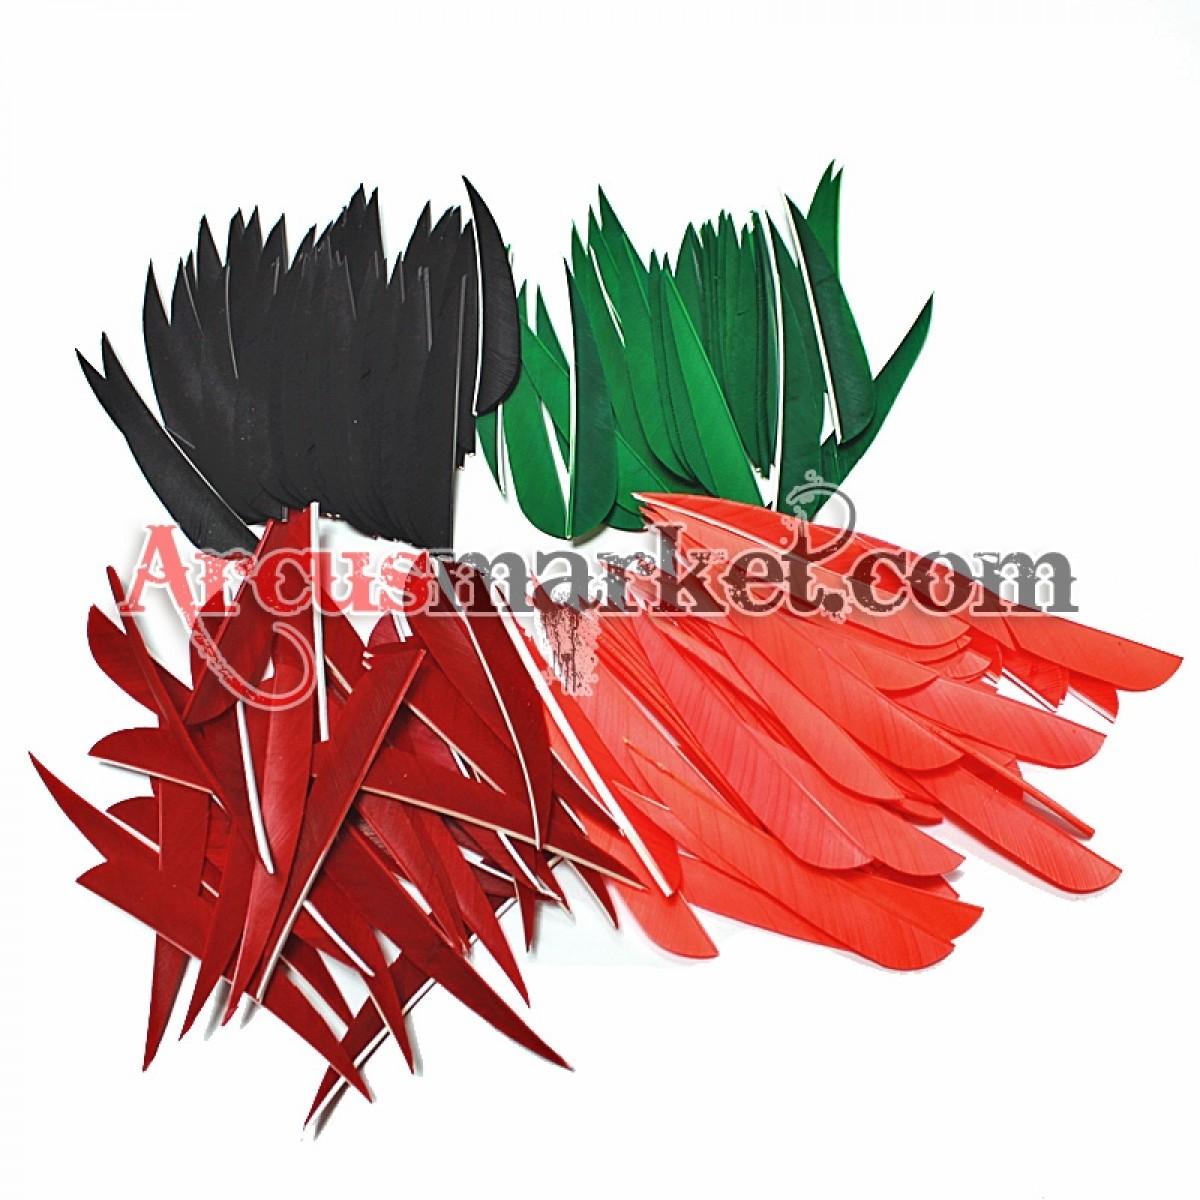 "Перо AMG Feathers 4"" Parabolic RW (12 штук)"